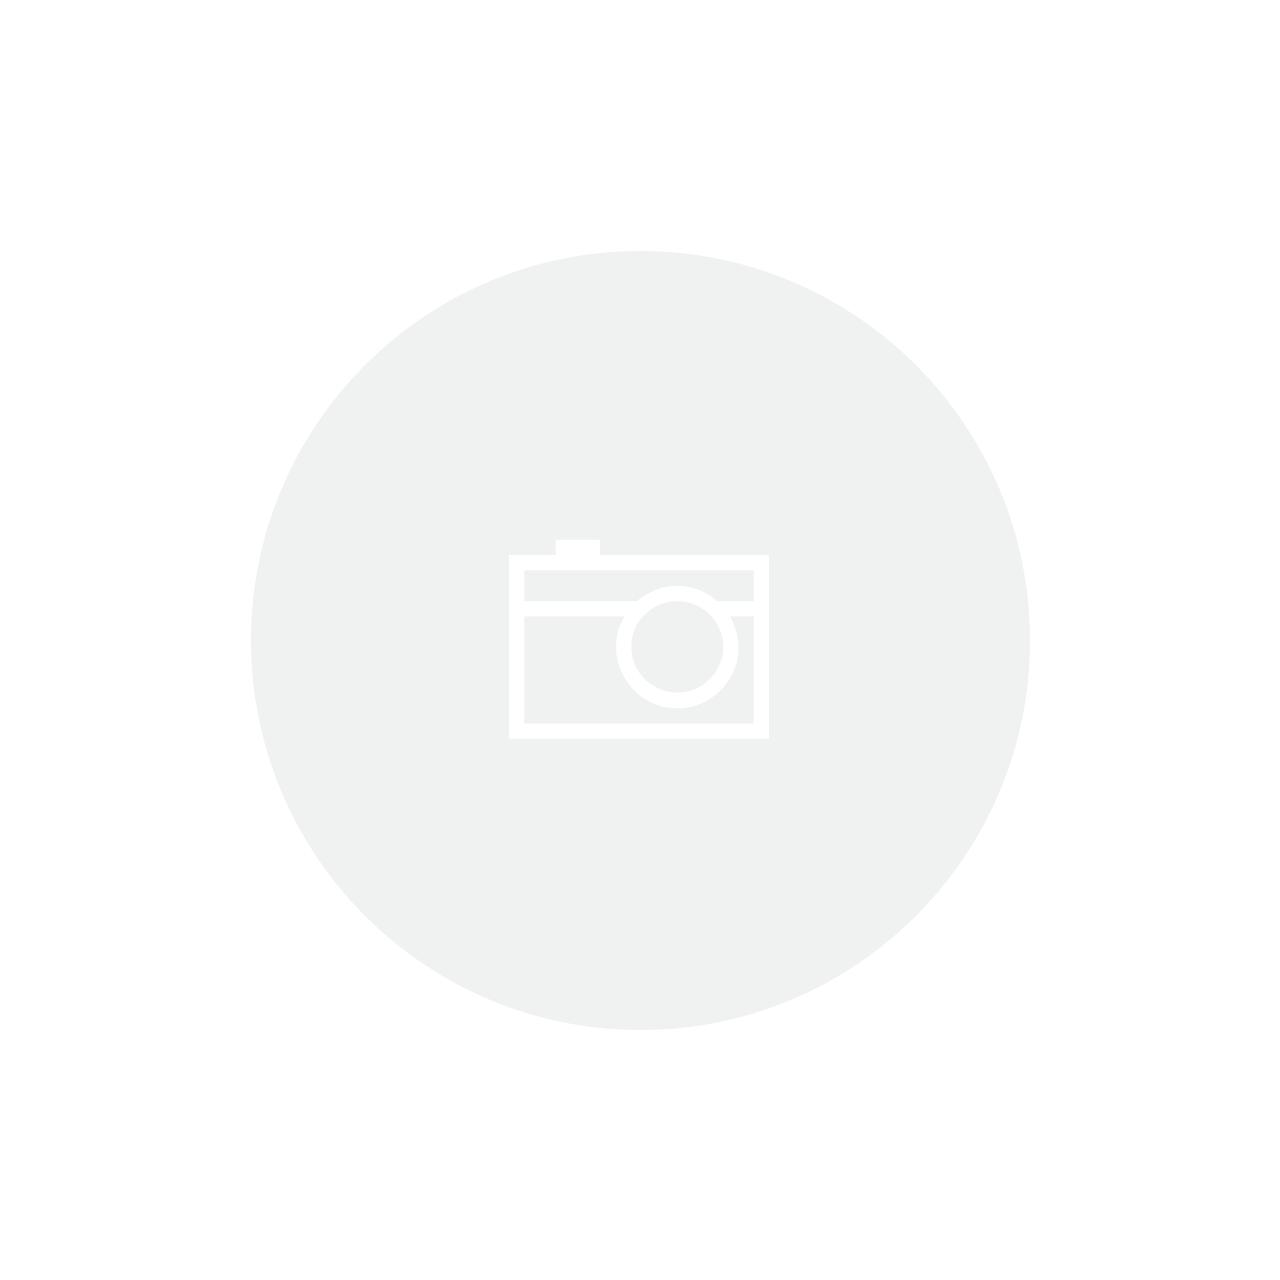 Papel Artesanal Indiano - Ref. 83